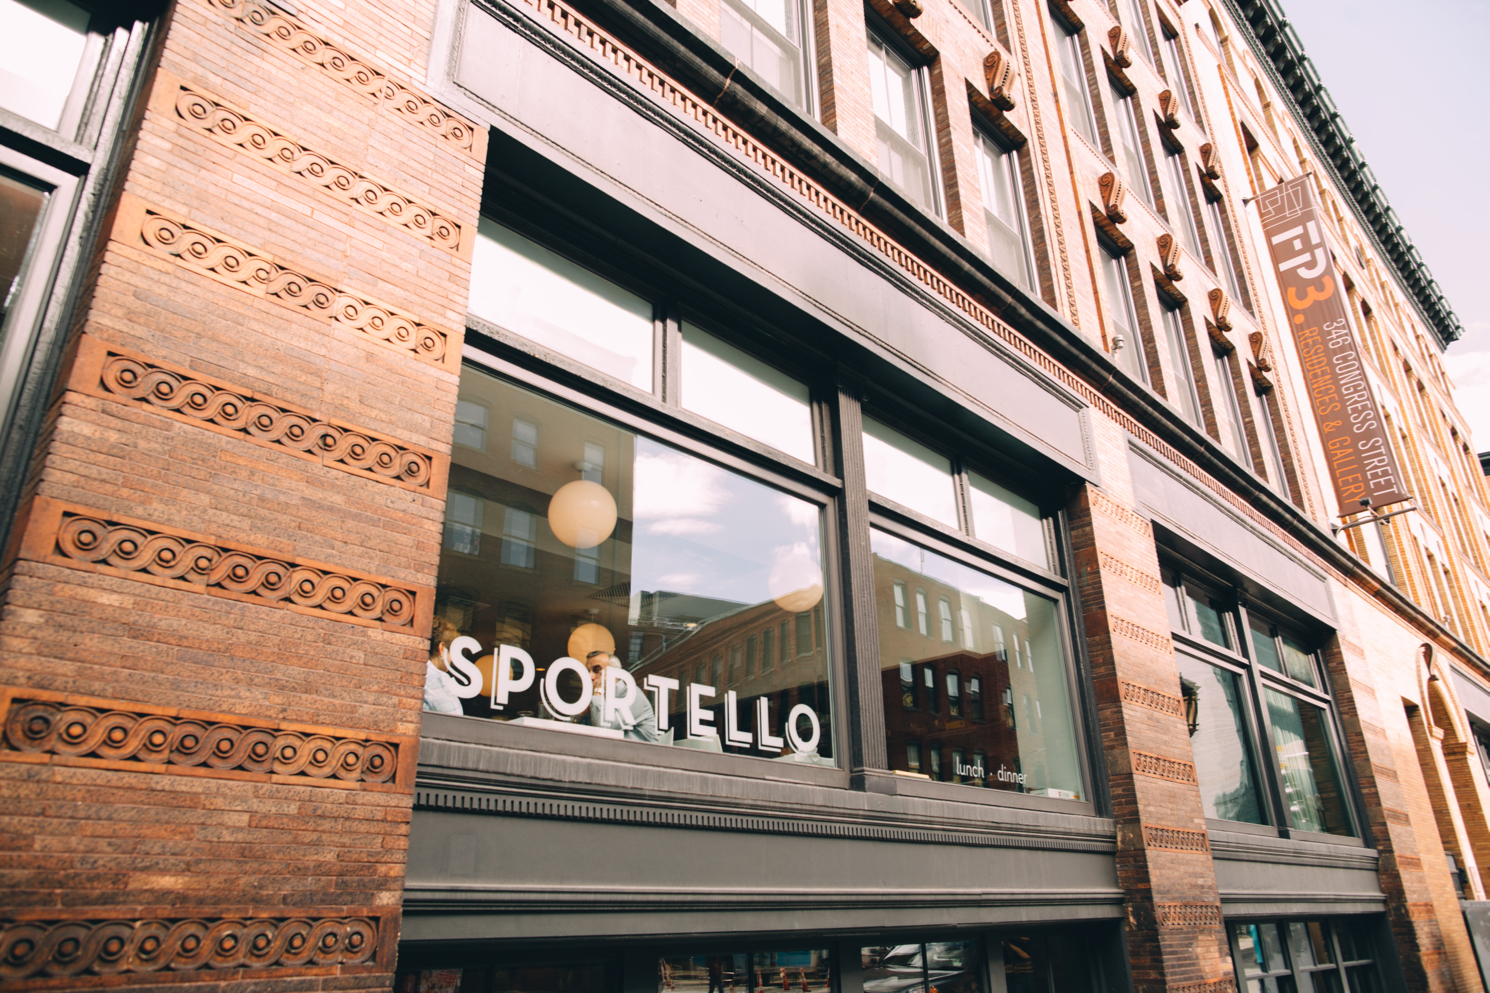 SPORTELLO_BRIAN SAMUELS PHOTOGRAPHY_SEPTEMBER2015 - 9